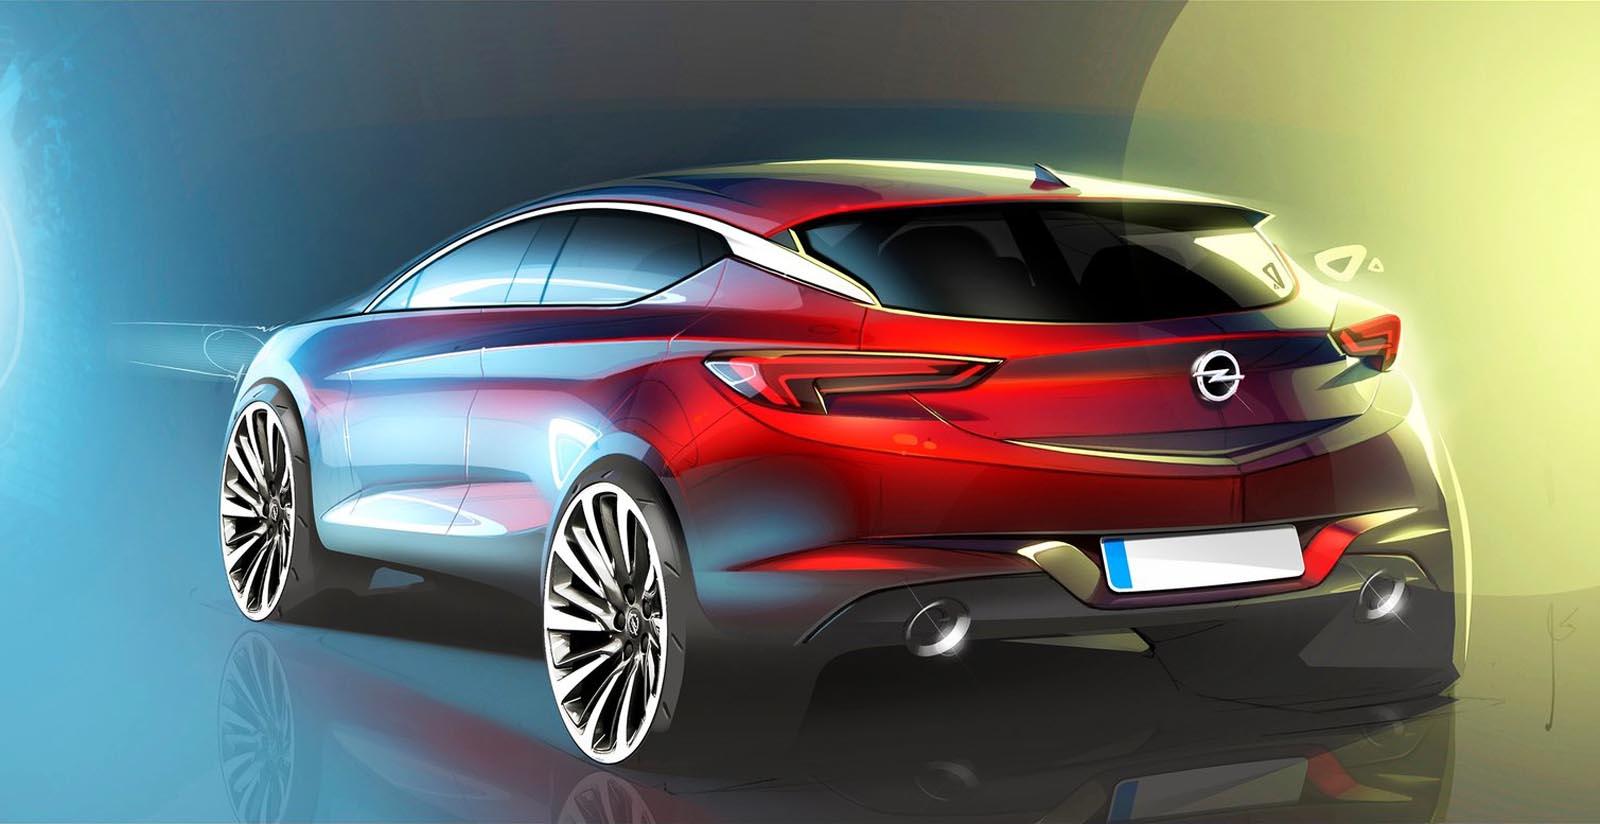 Photo of Νέο Opel Astra που θα μπαίνει και στην πρίζα